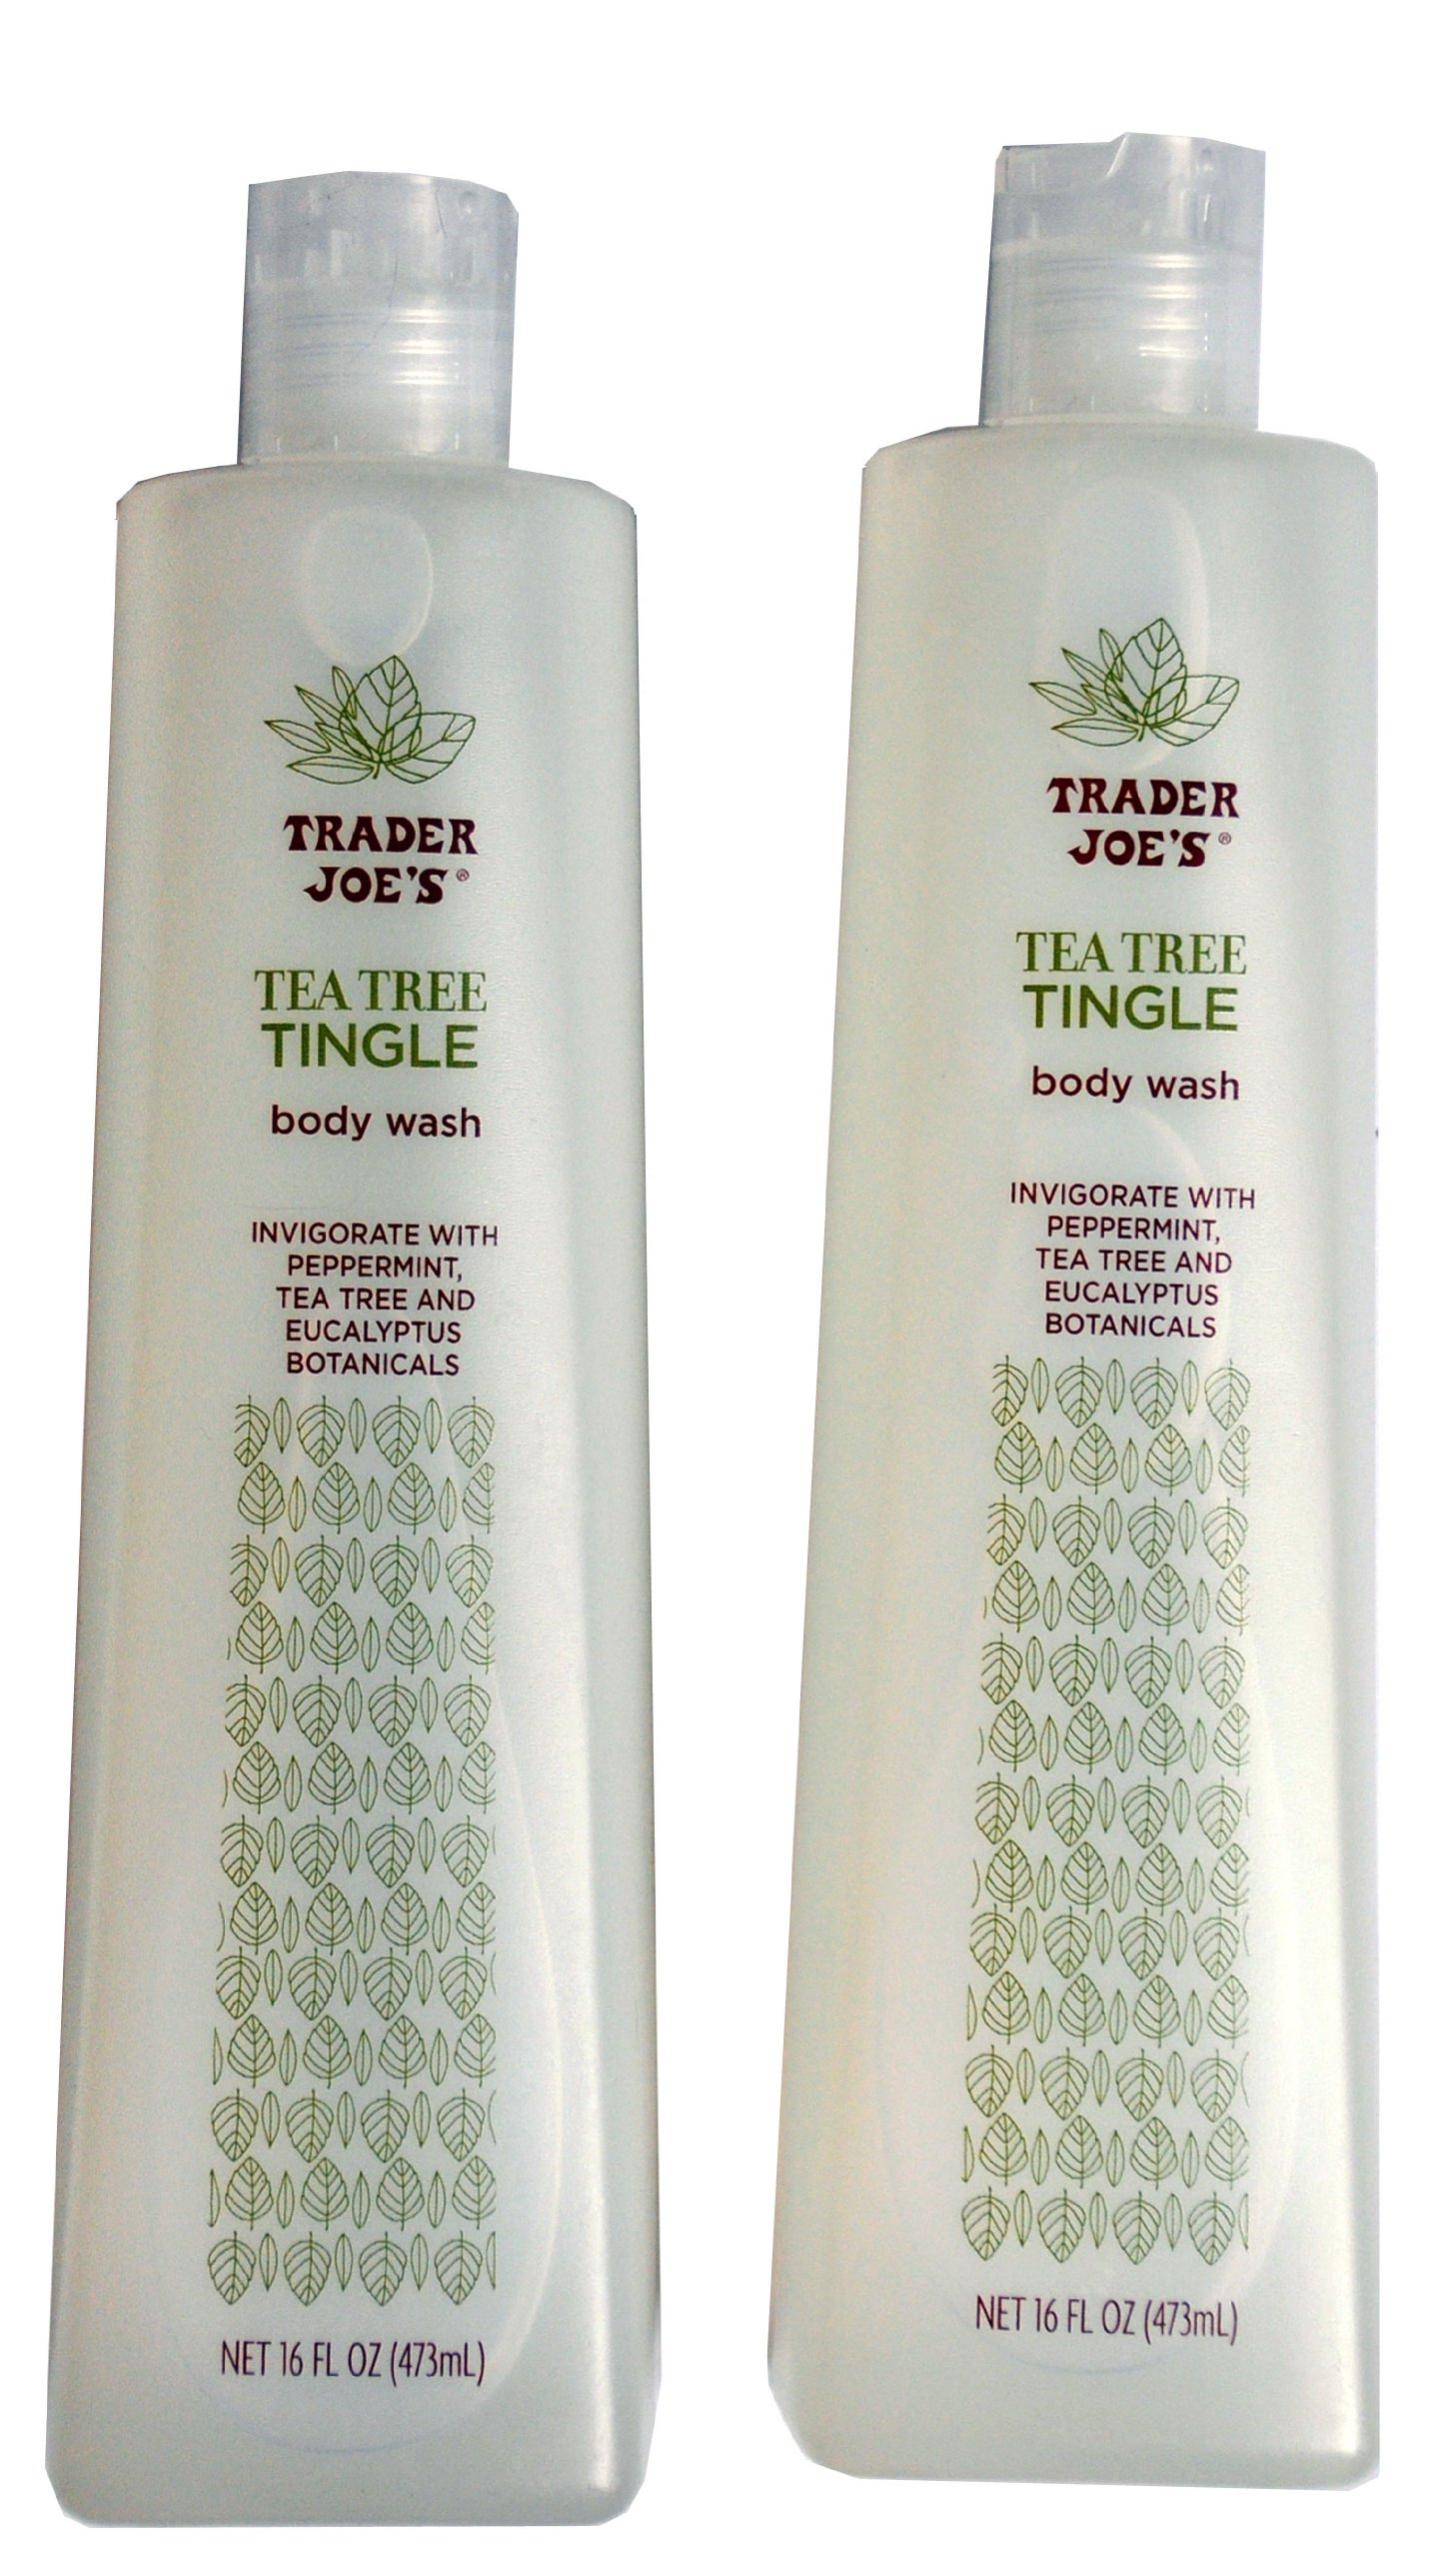 trader joe 39 s tea tree tingle shampoo with peppermint tea tree and eucalyptus. Black Bedroom Furniture Sets. Home Design Ideas